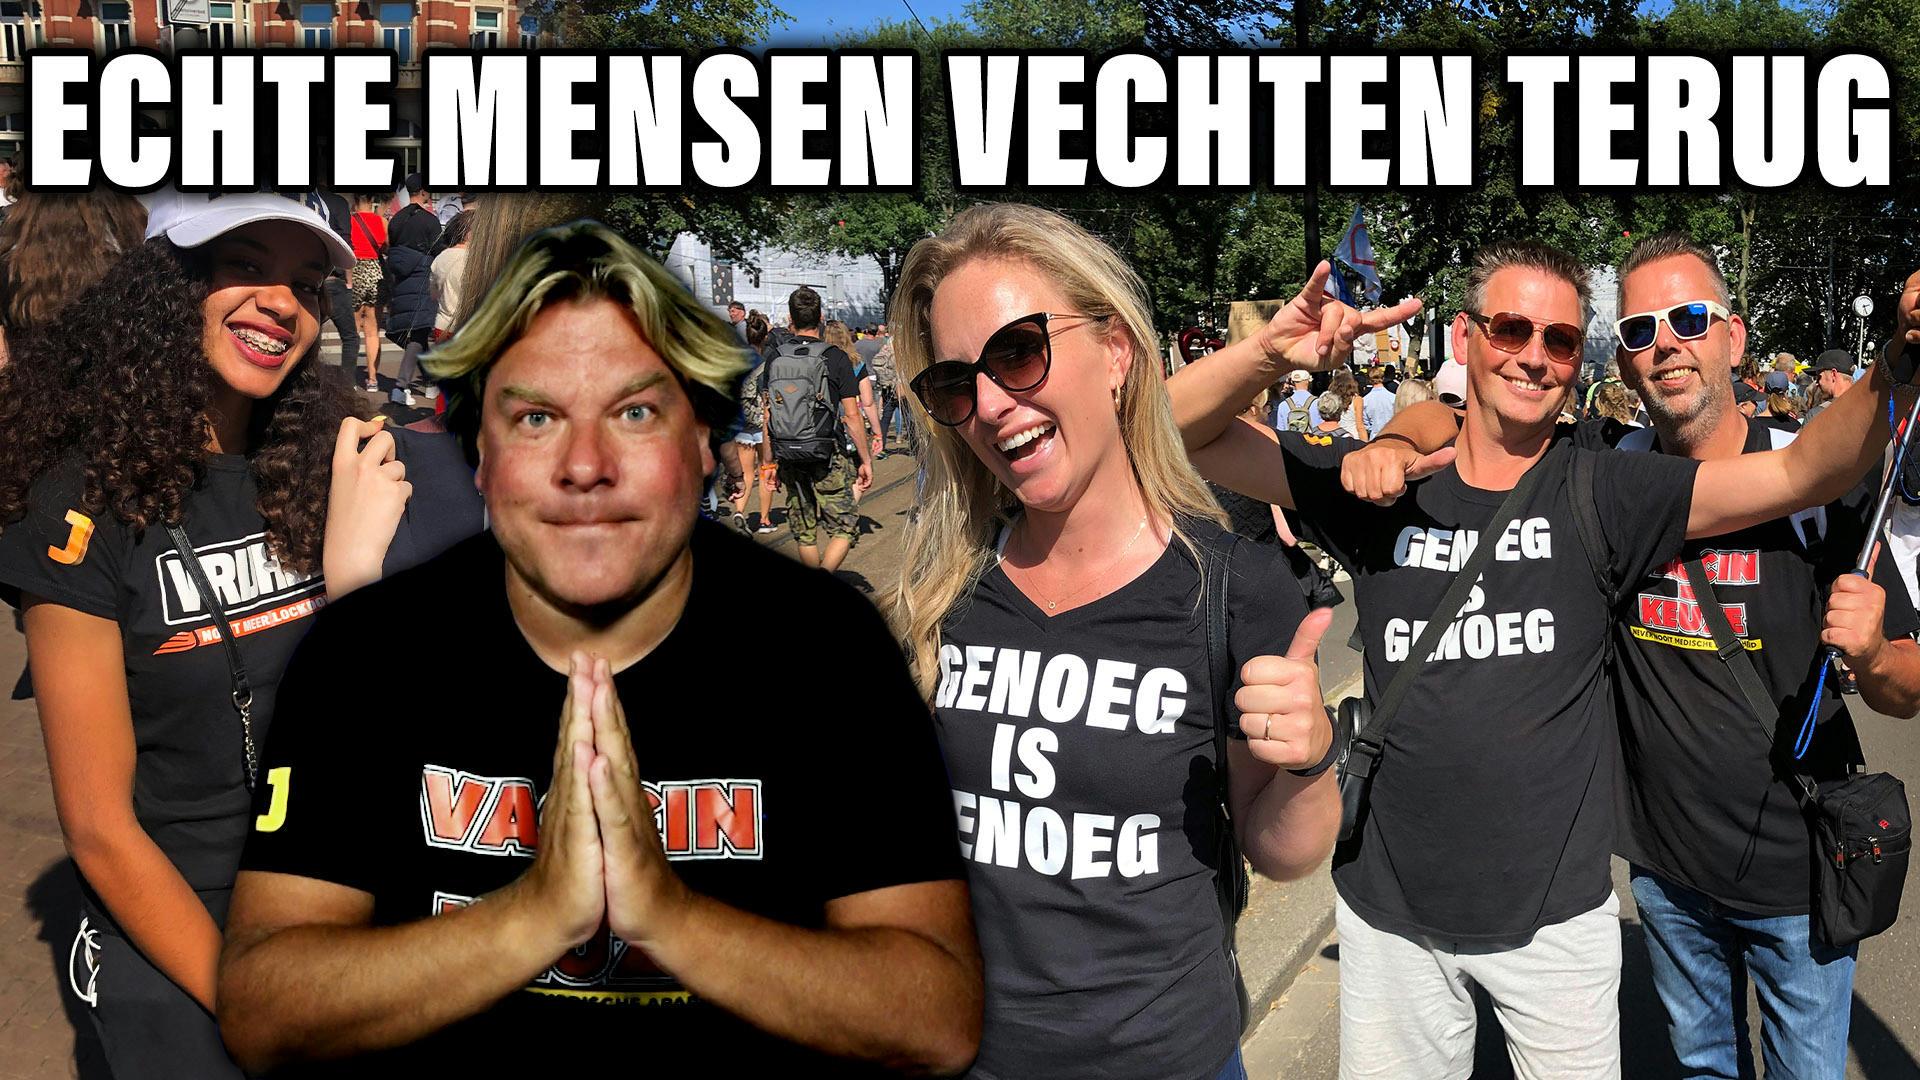 jensen.nl